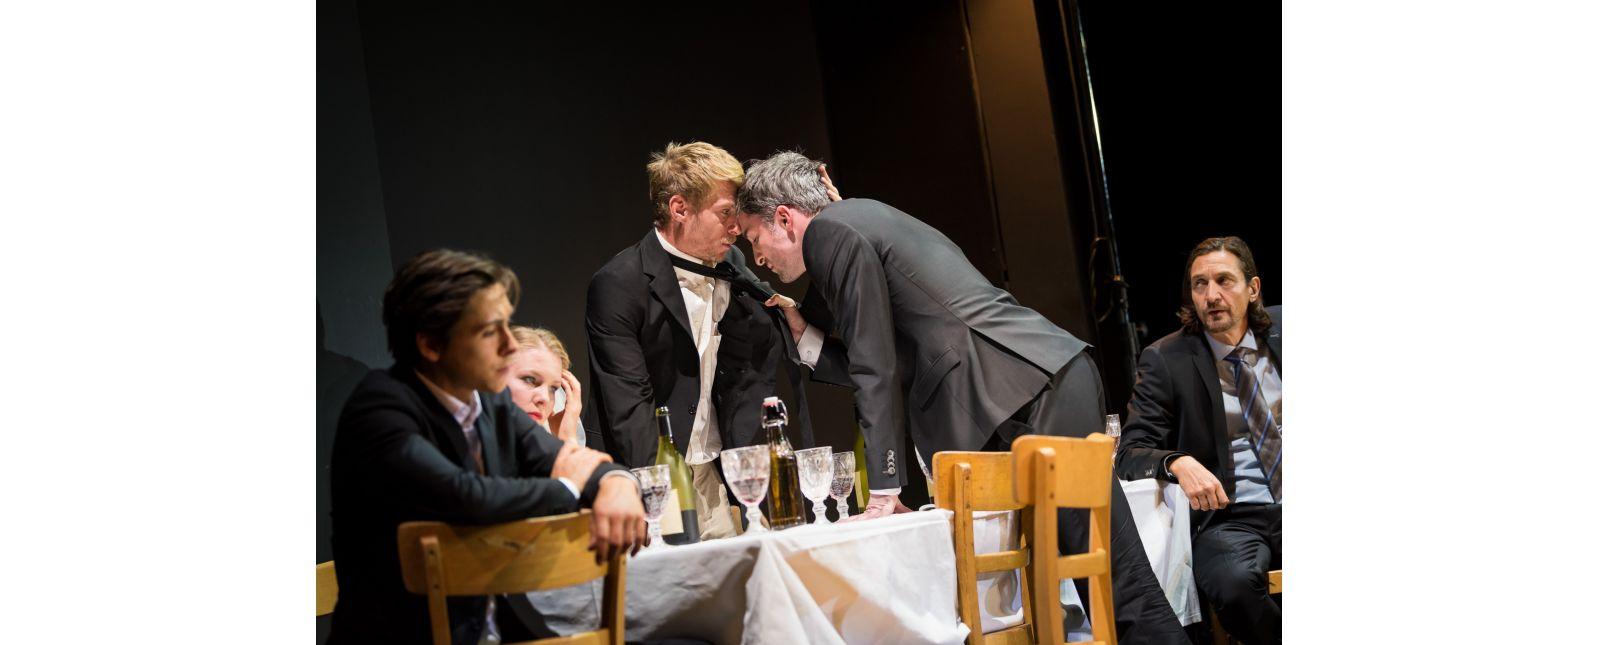 Das Nibelungenlied // Lukas Hupfeld // Janna Horstmann // Martin Hohner // Tim Al-Windawe // Victor Calero //  2018 //  Foto: Marc Doradzillo